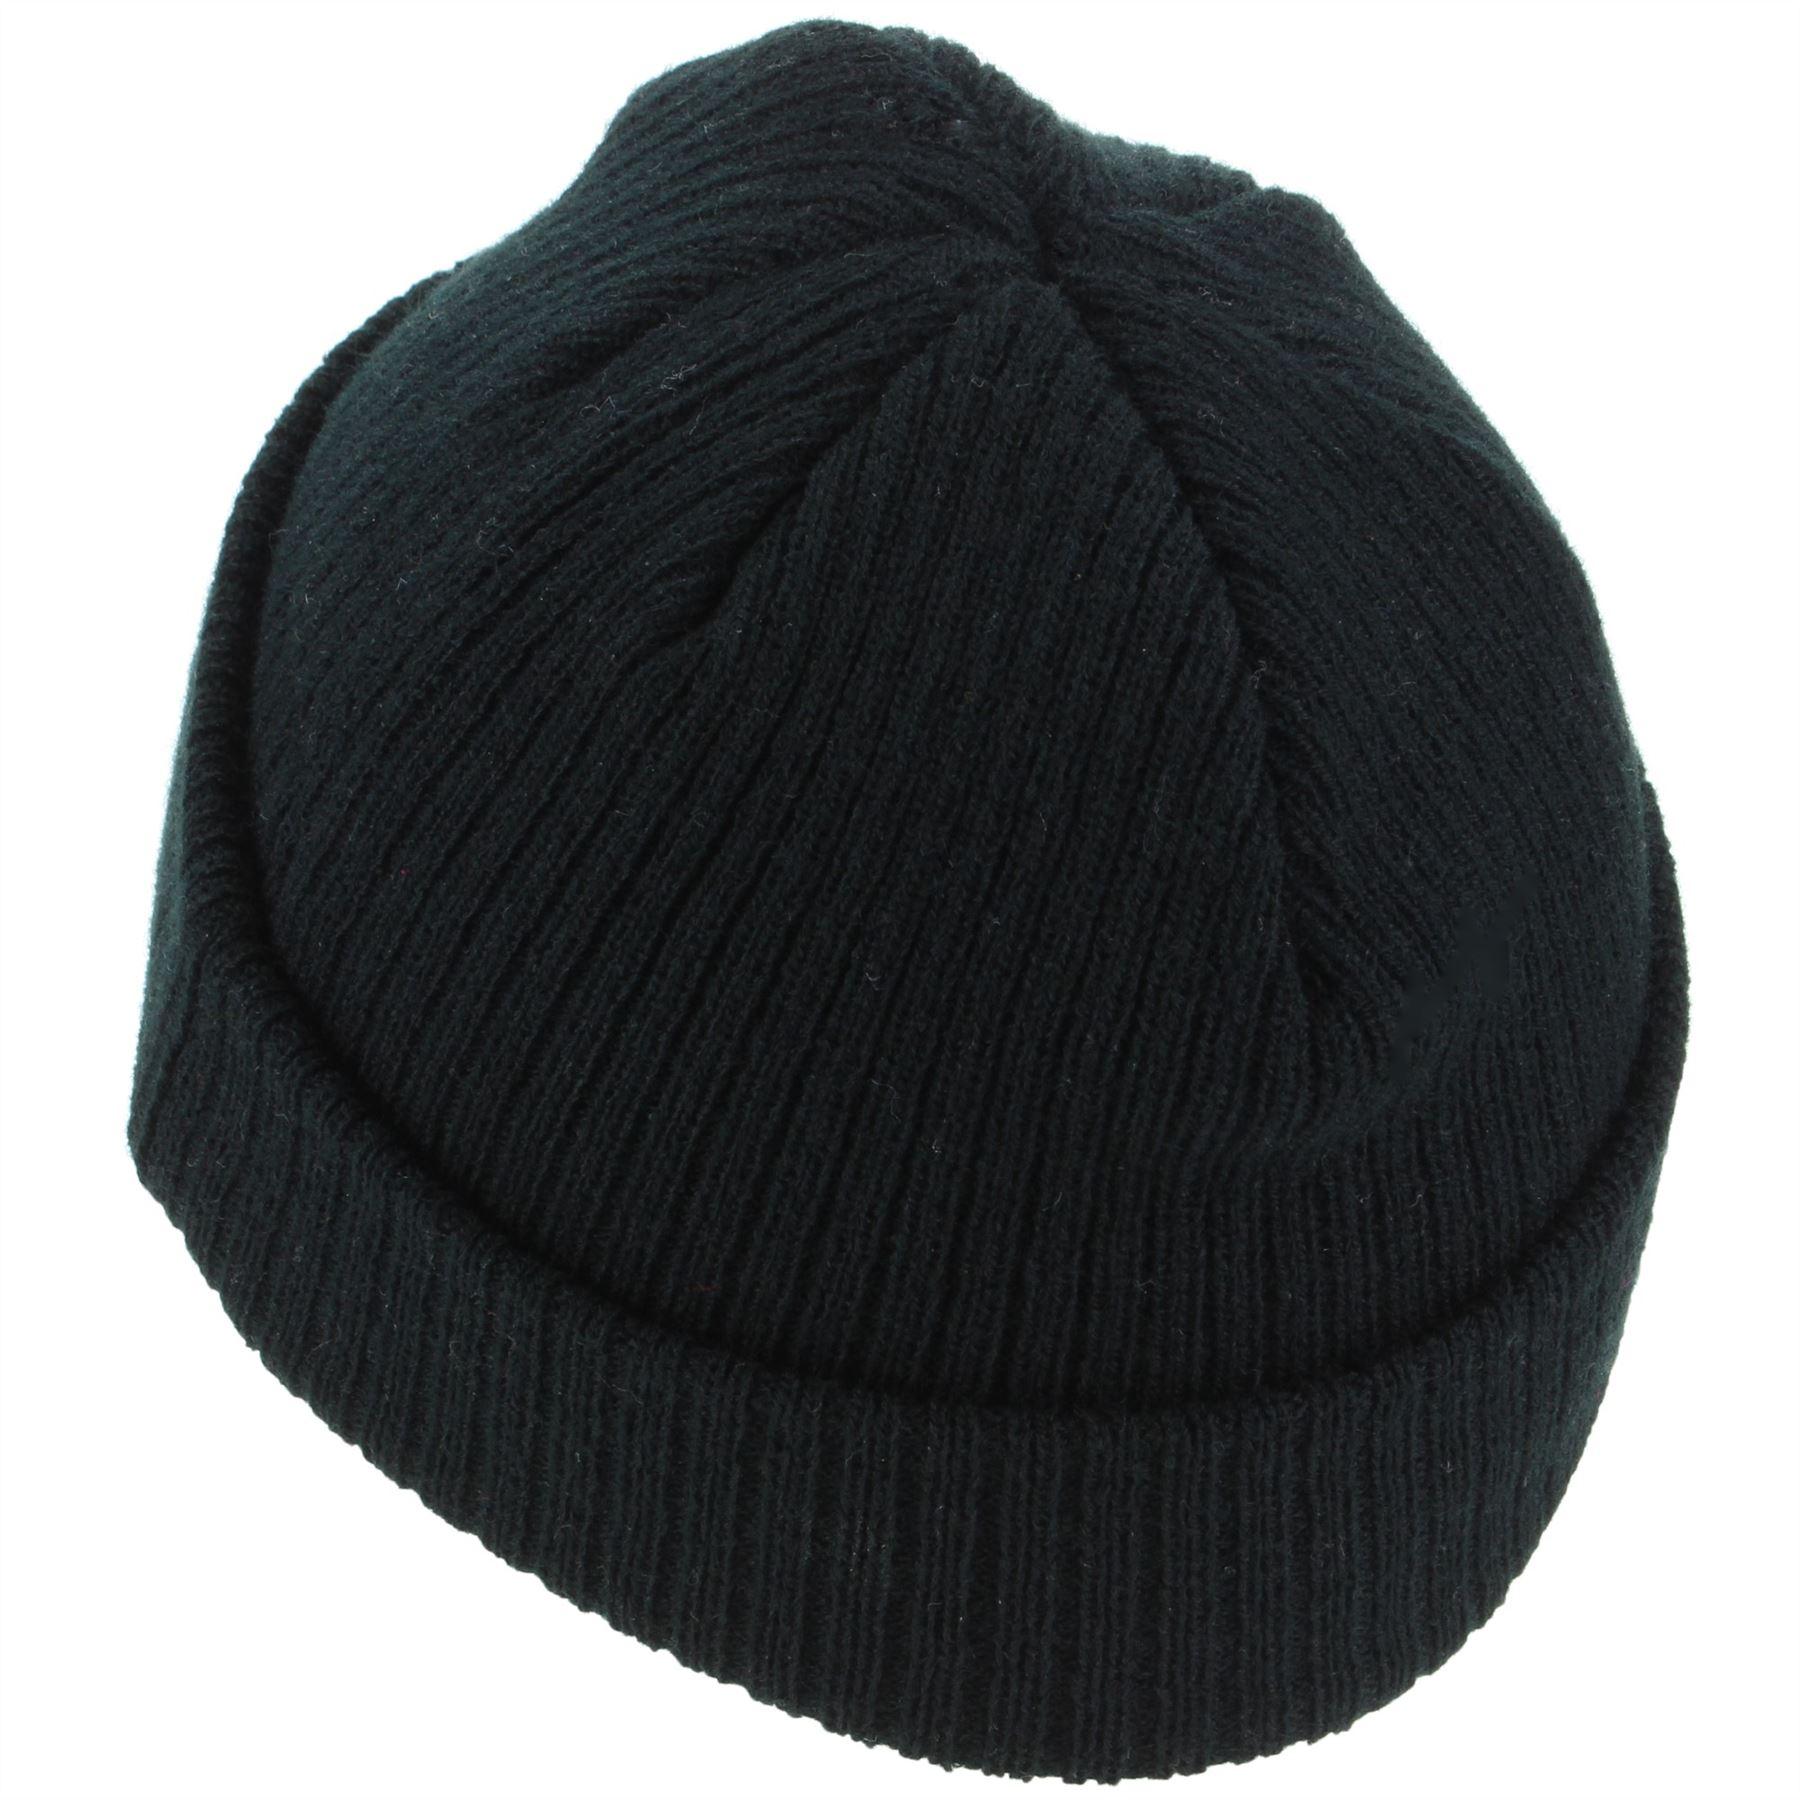 Mini Beanie Hat Fishermans Cap Mens Womens Black Maroon Blue Winter ... 97af6ca0d3